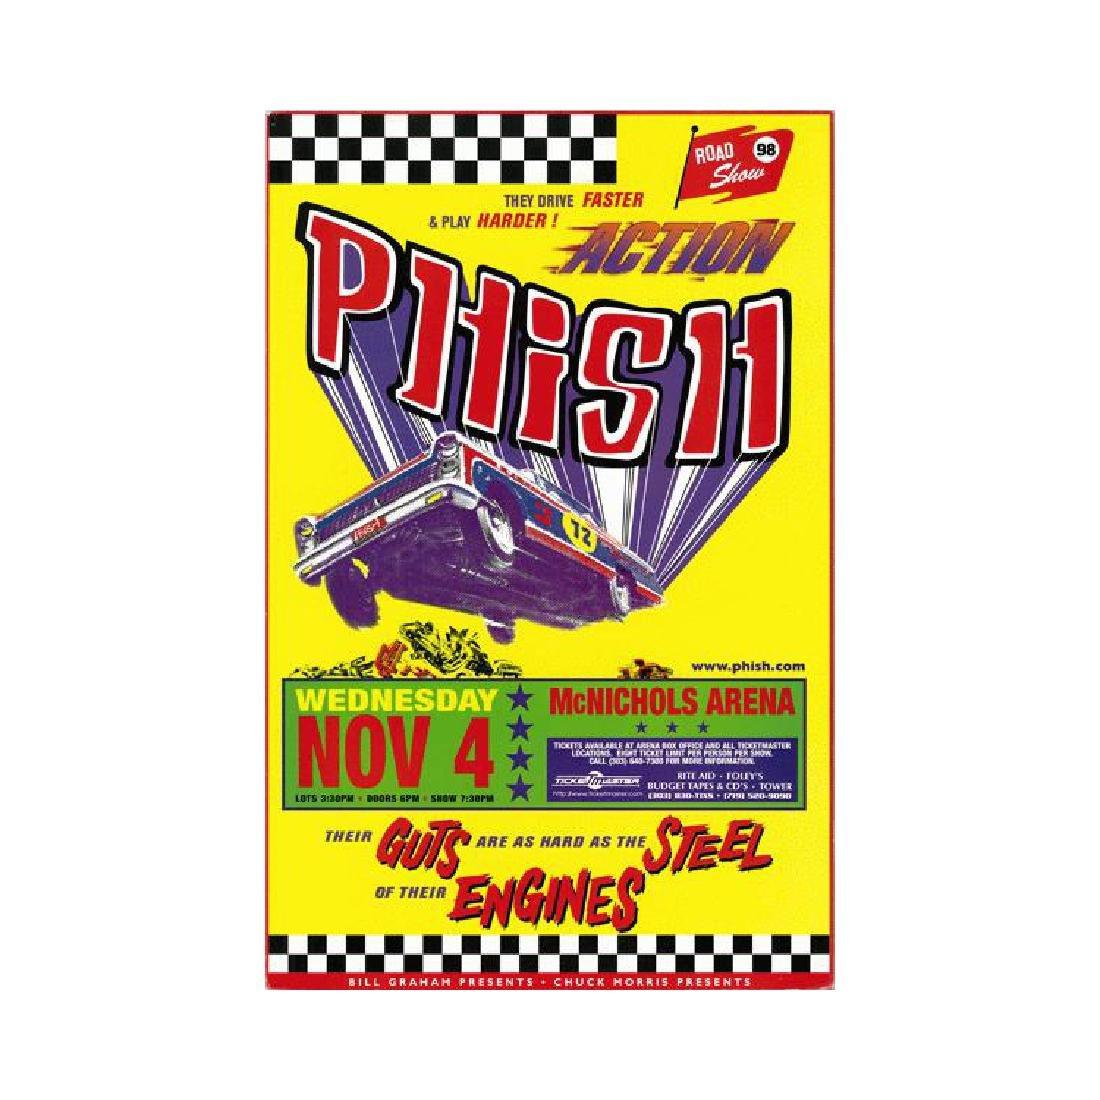 PHISH - 1998 Concert Poster